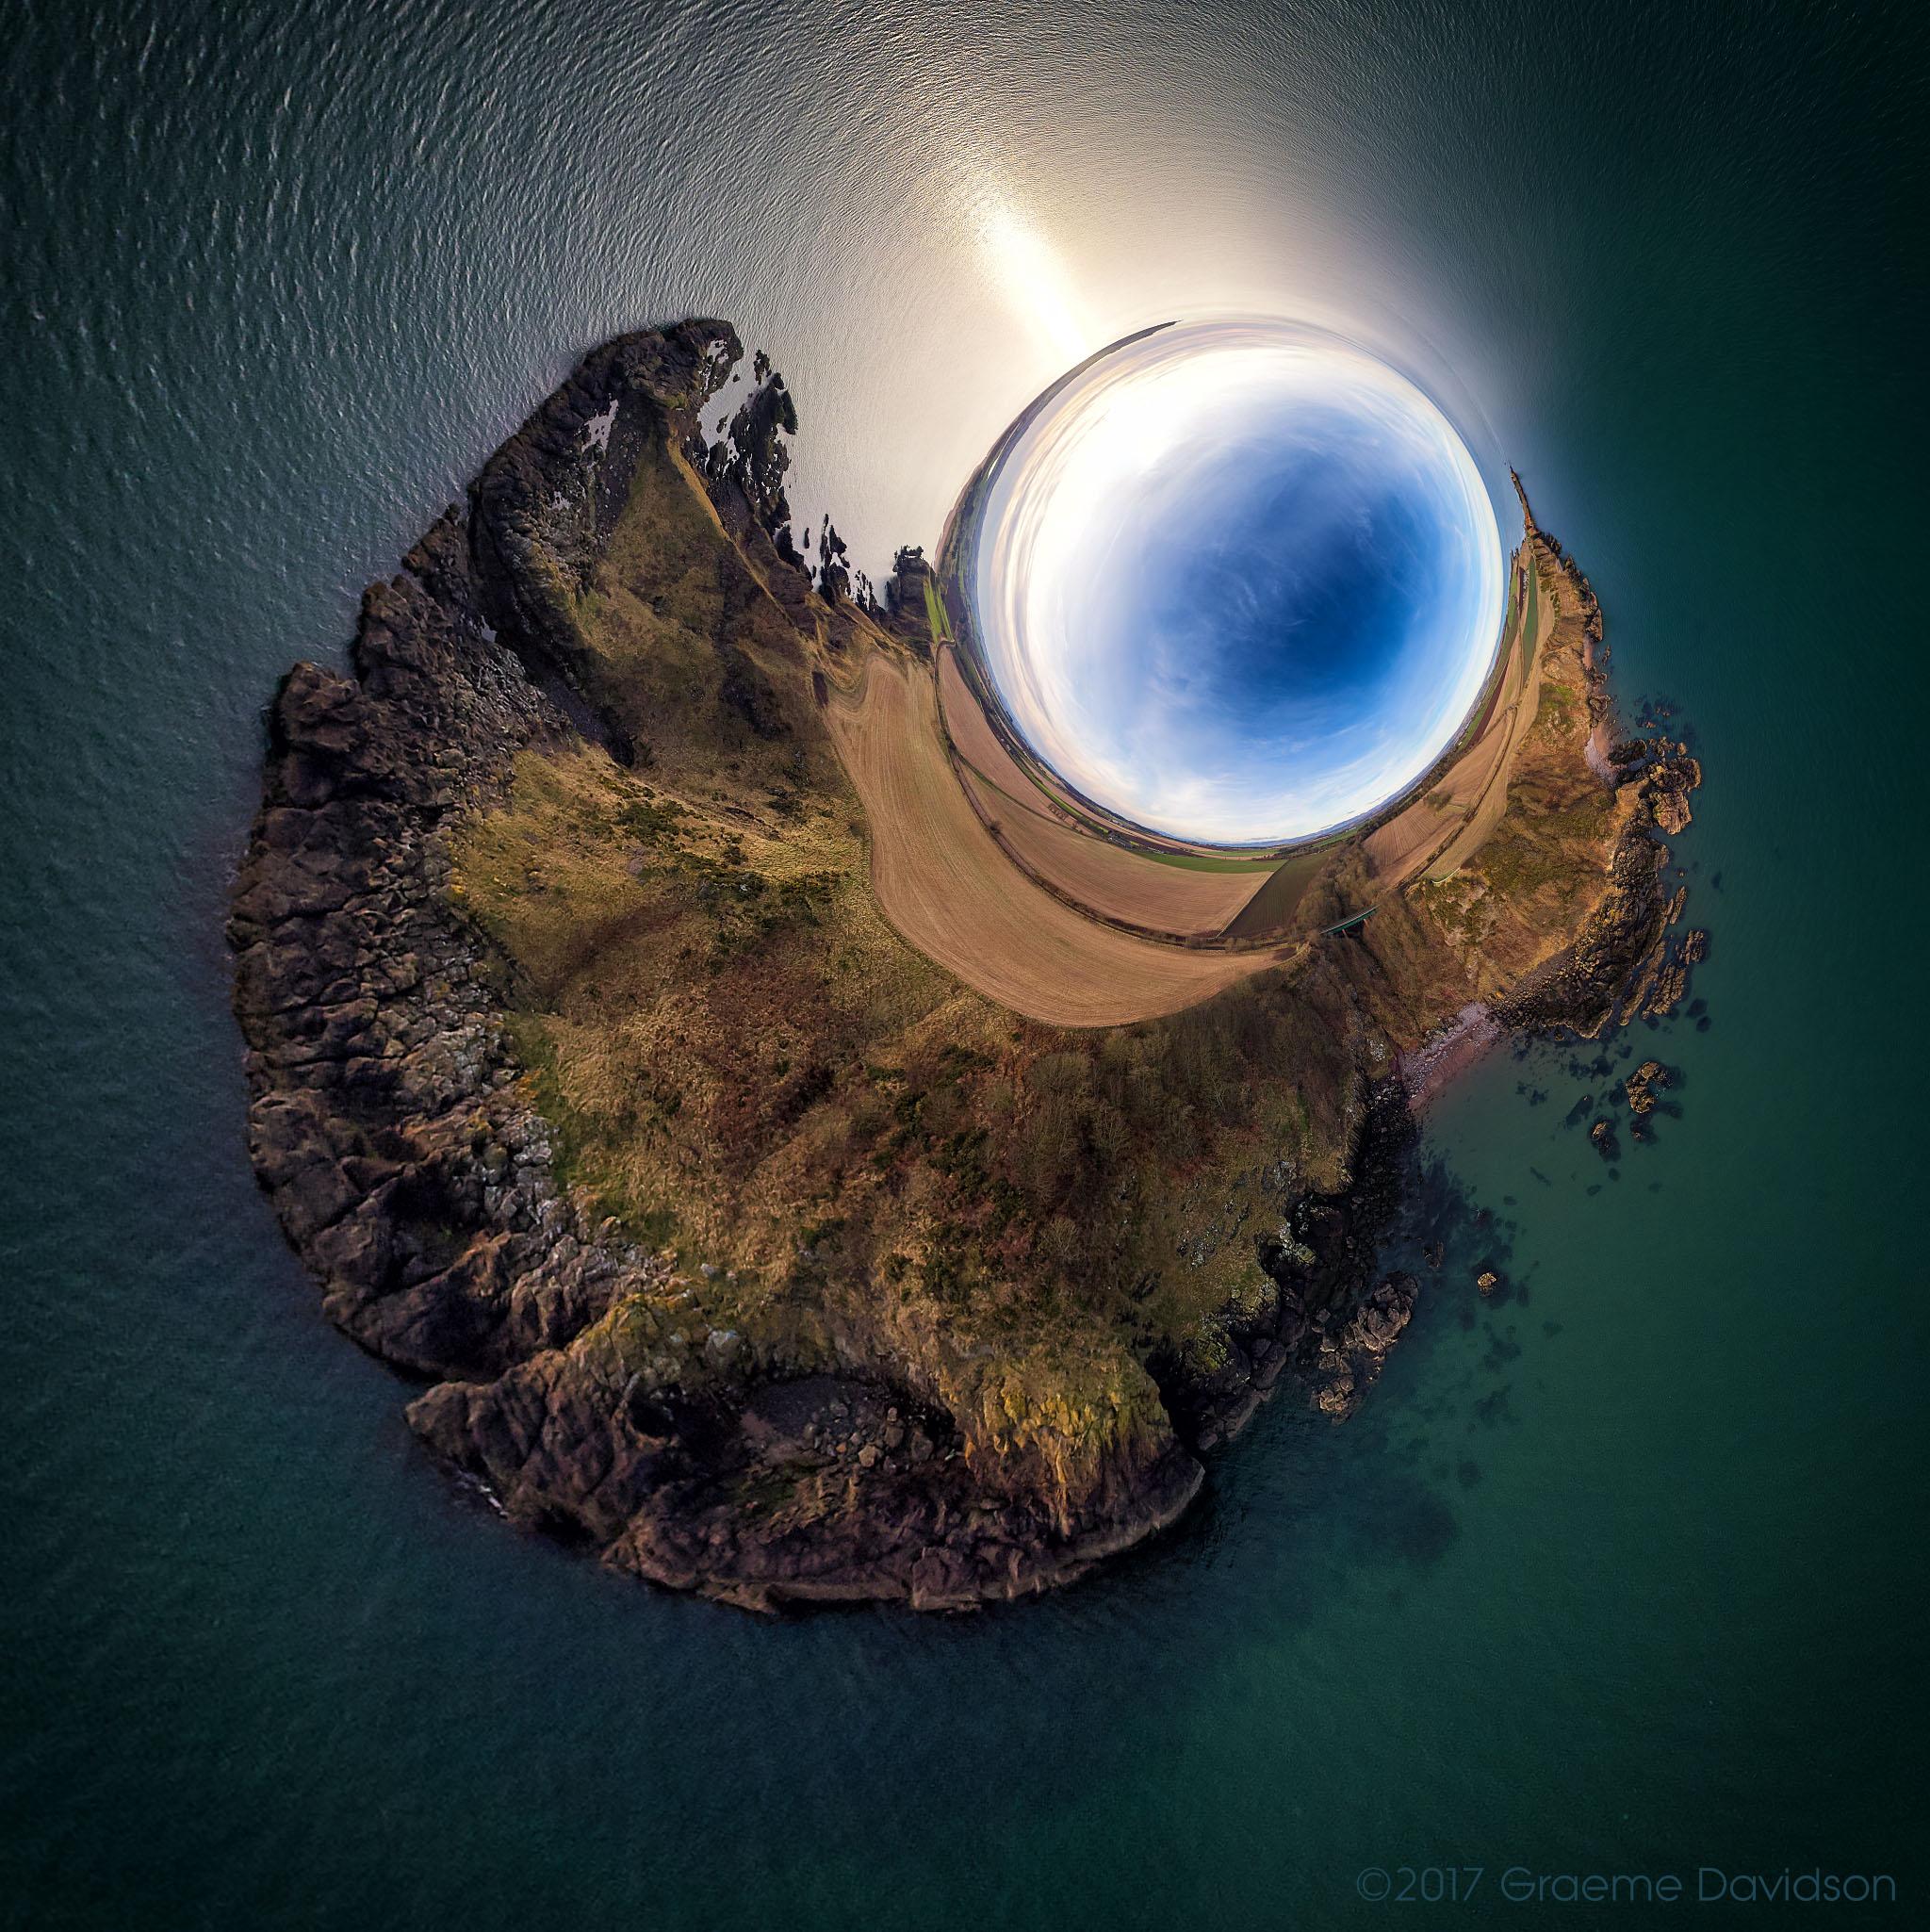 Boddin - Inverted little planet